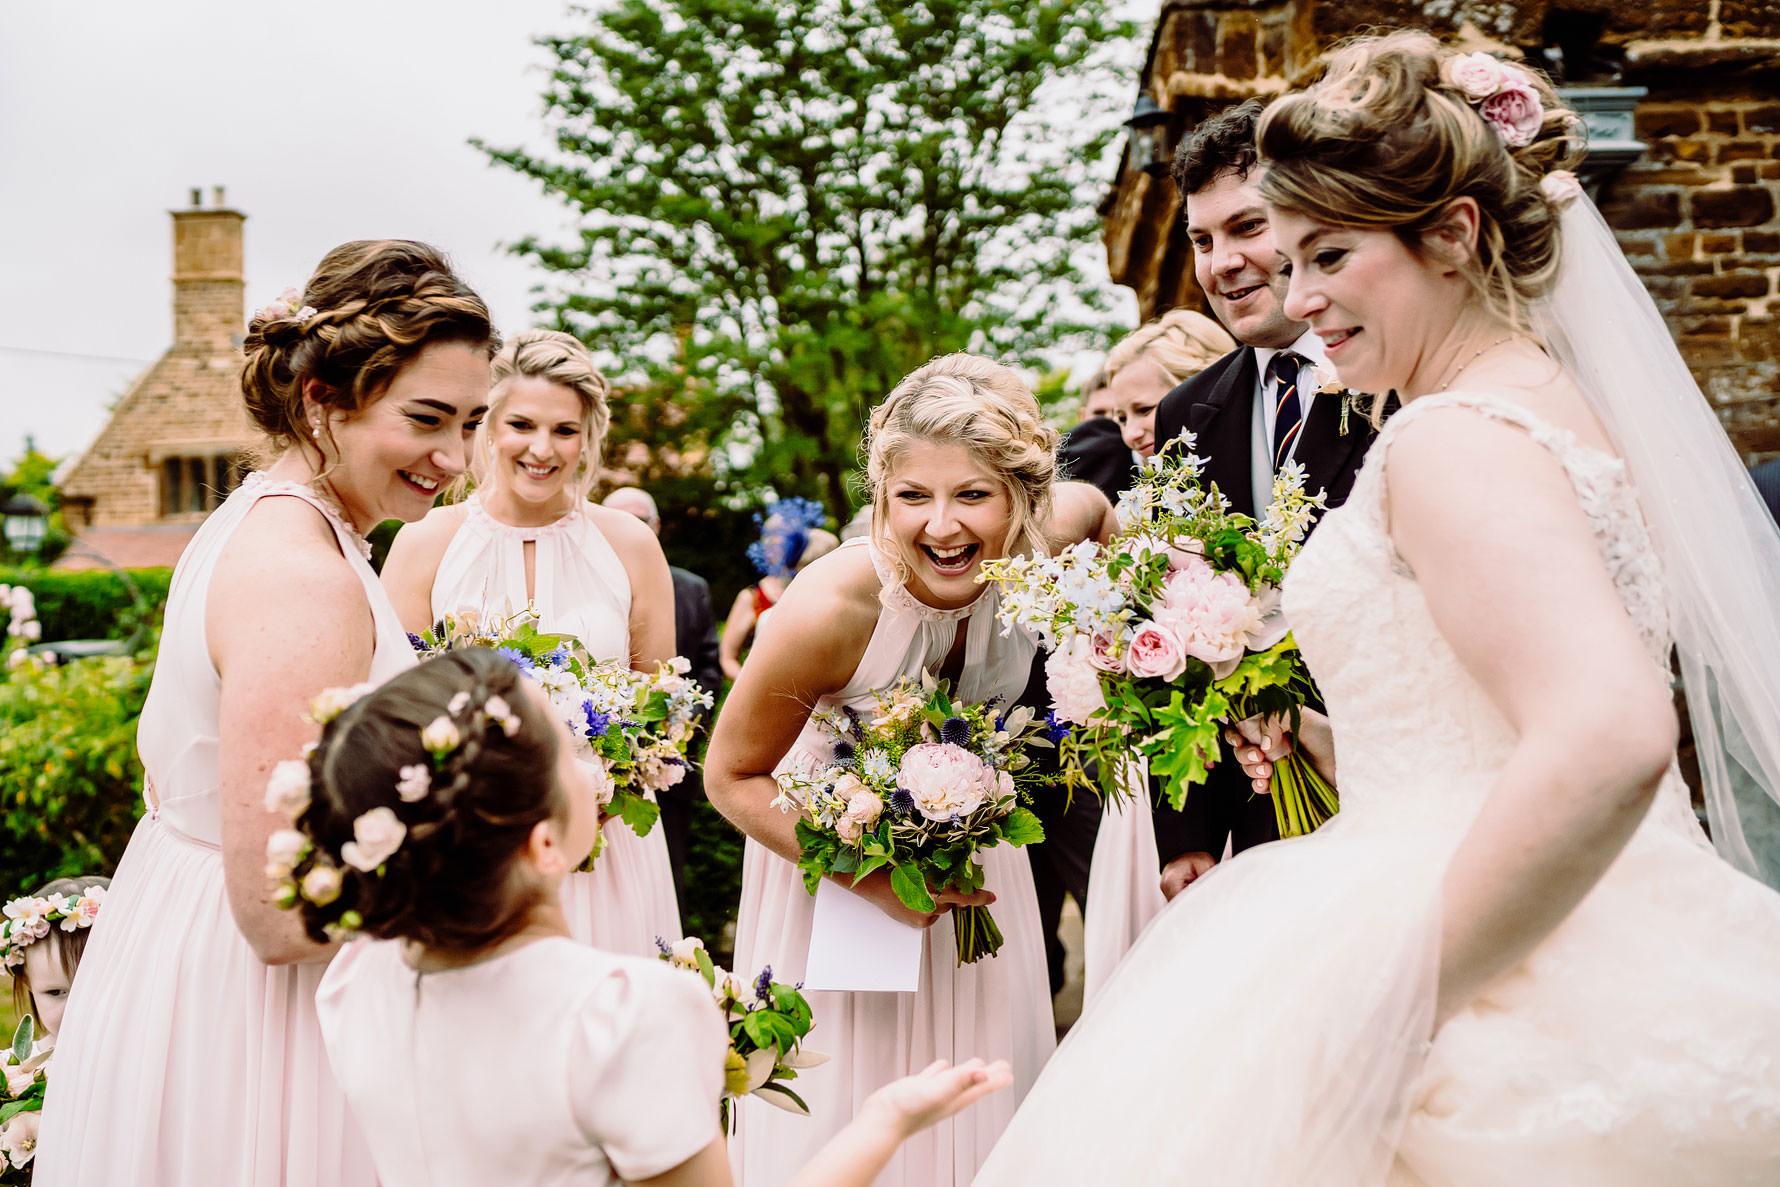 a happy bridemaid at a wedding